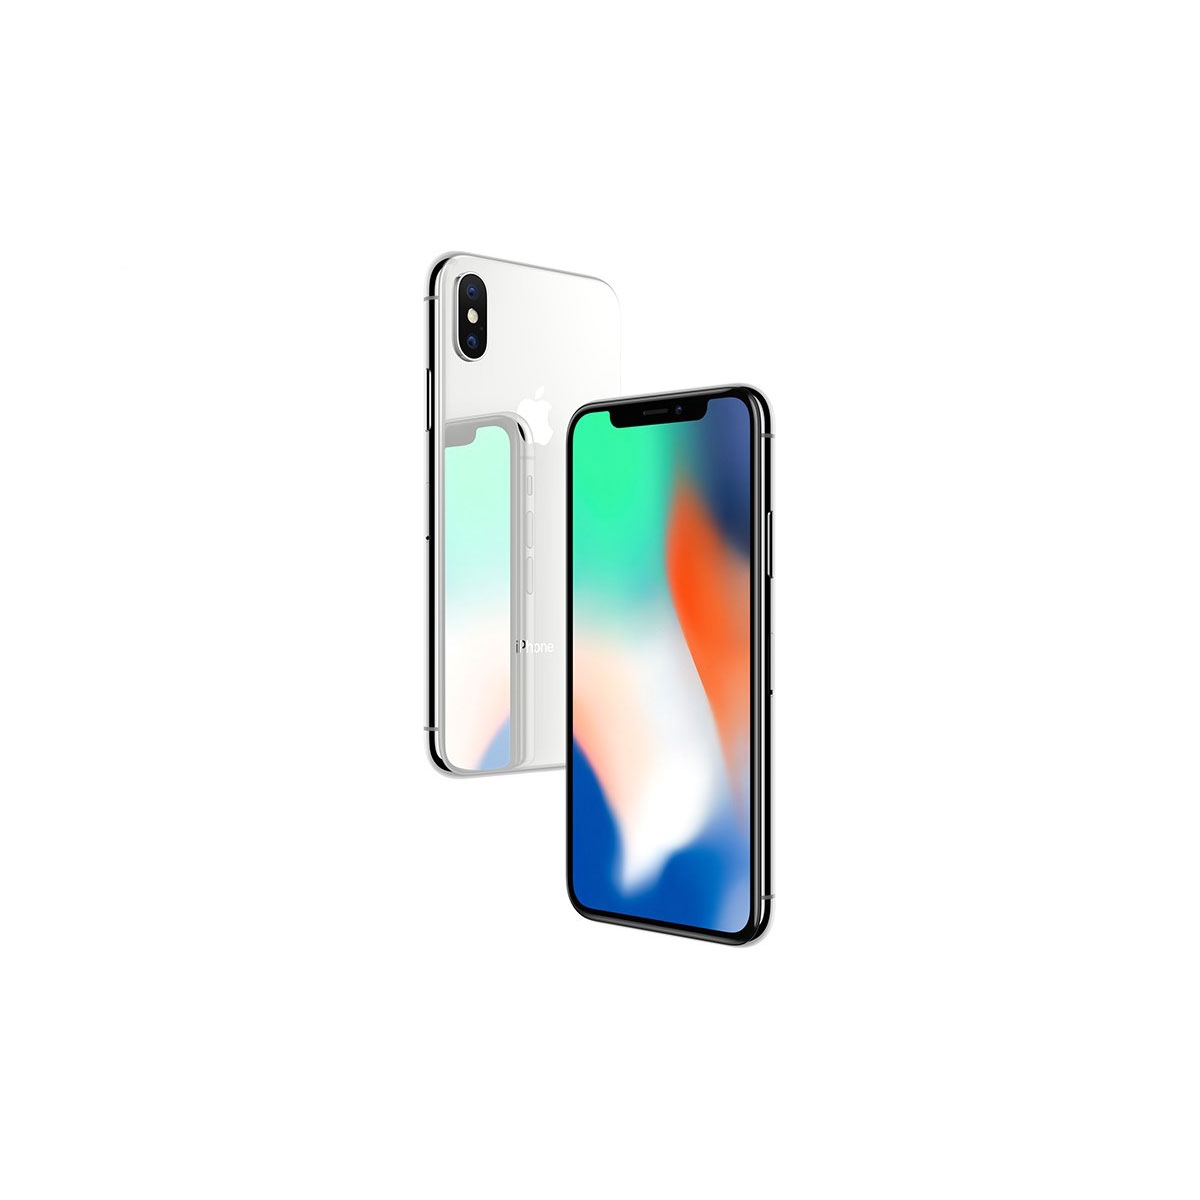 گوشي موبايل اپل مدل iPhone X ظرفيت 64 گيگابايت